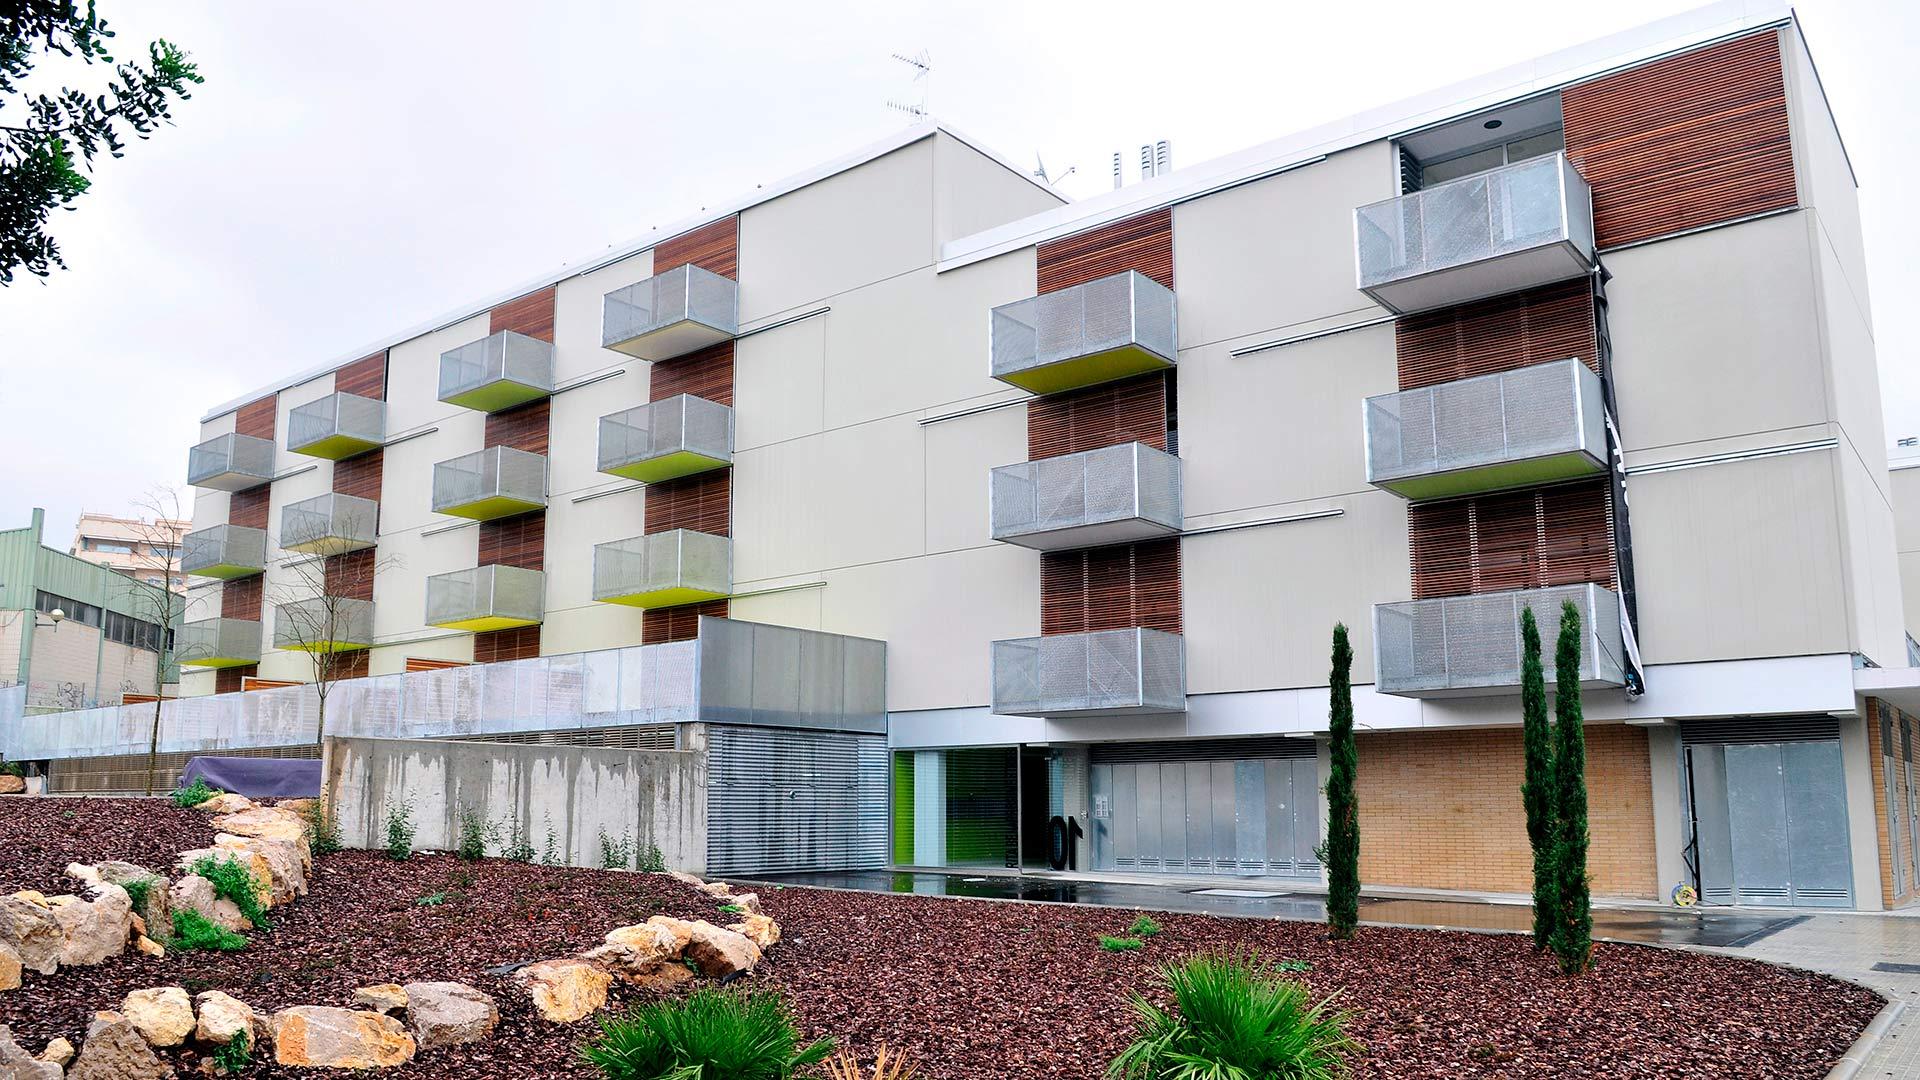 Bloque de viviendas sociales en Sitges